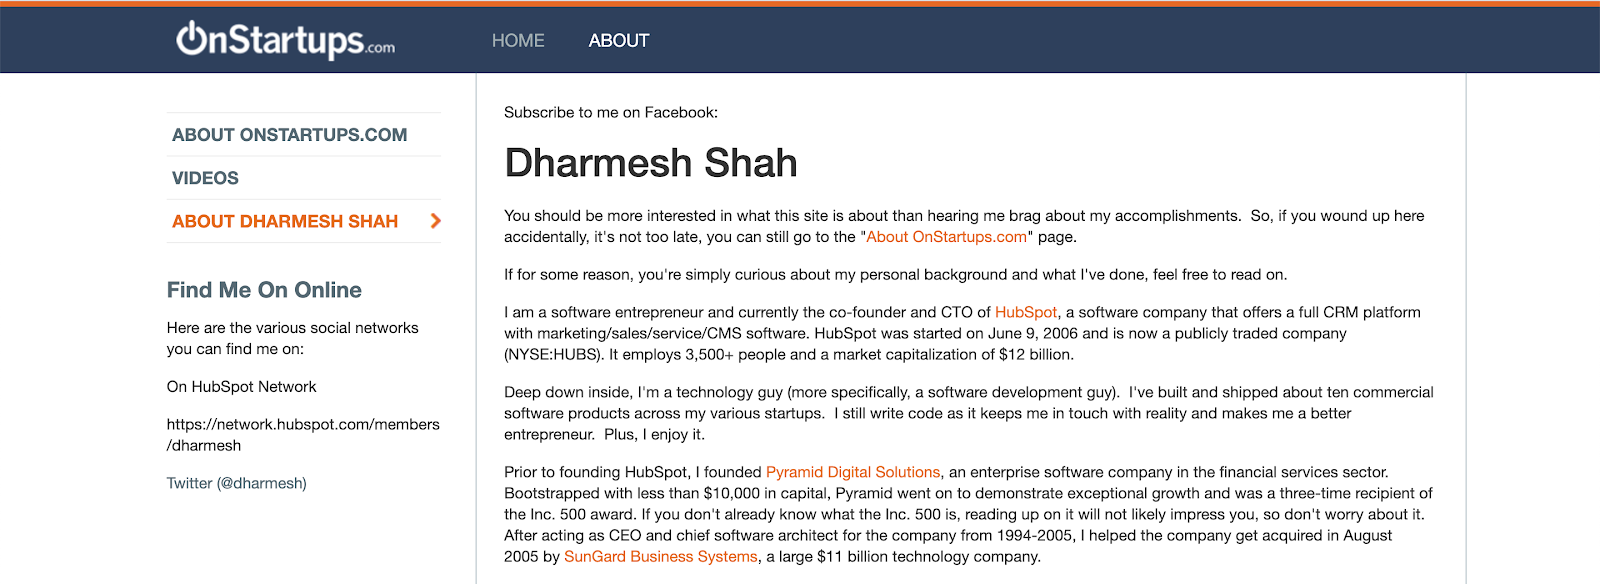 dharmesh's onstartups bio